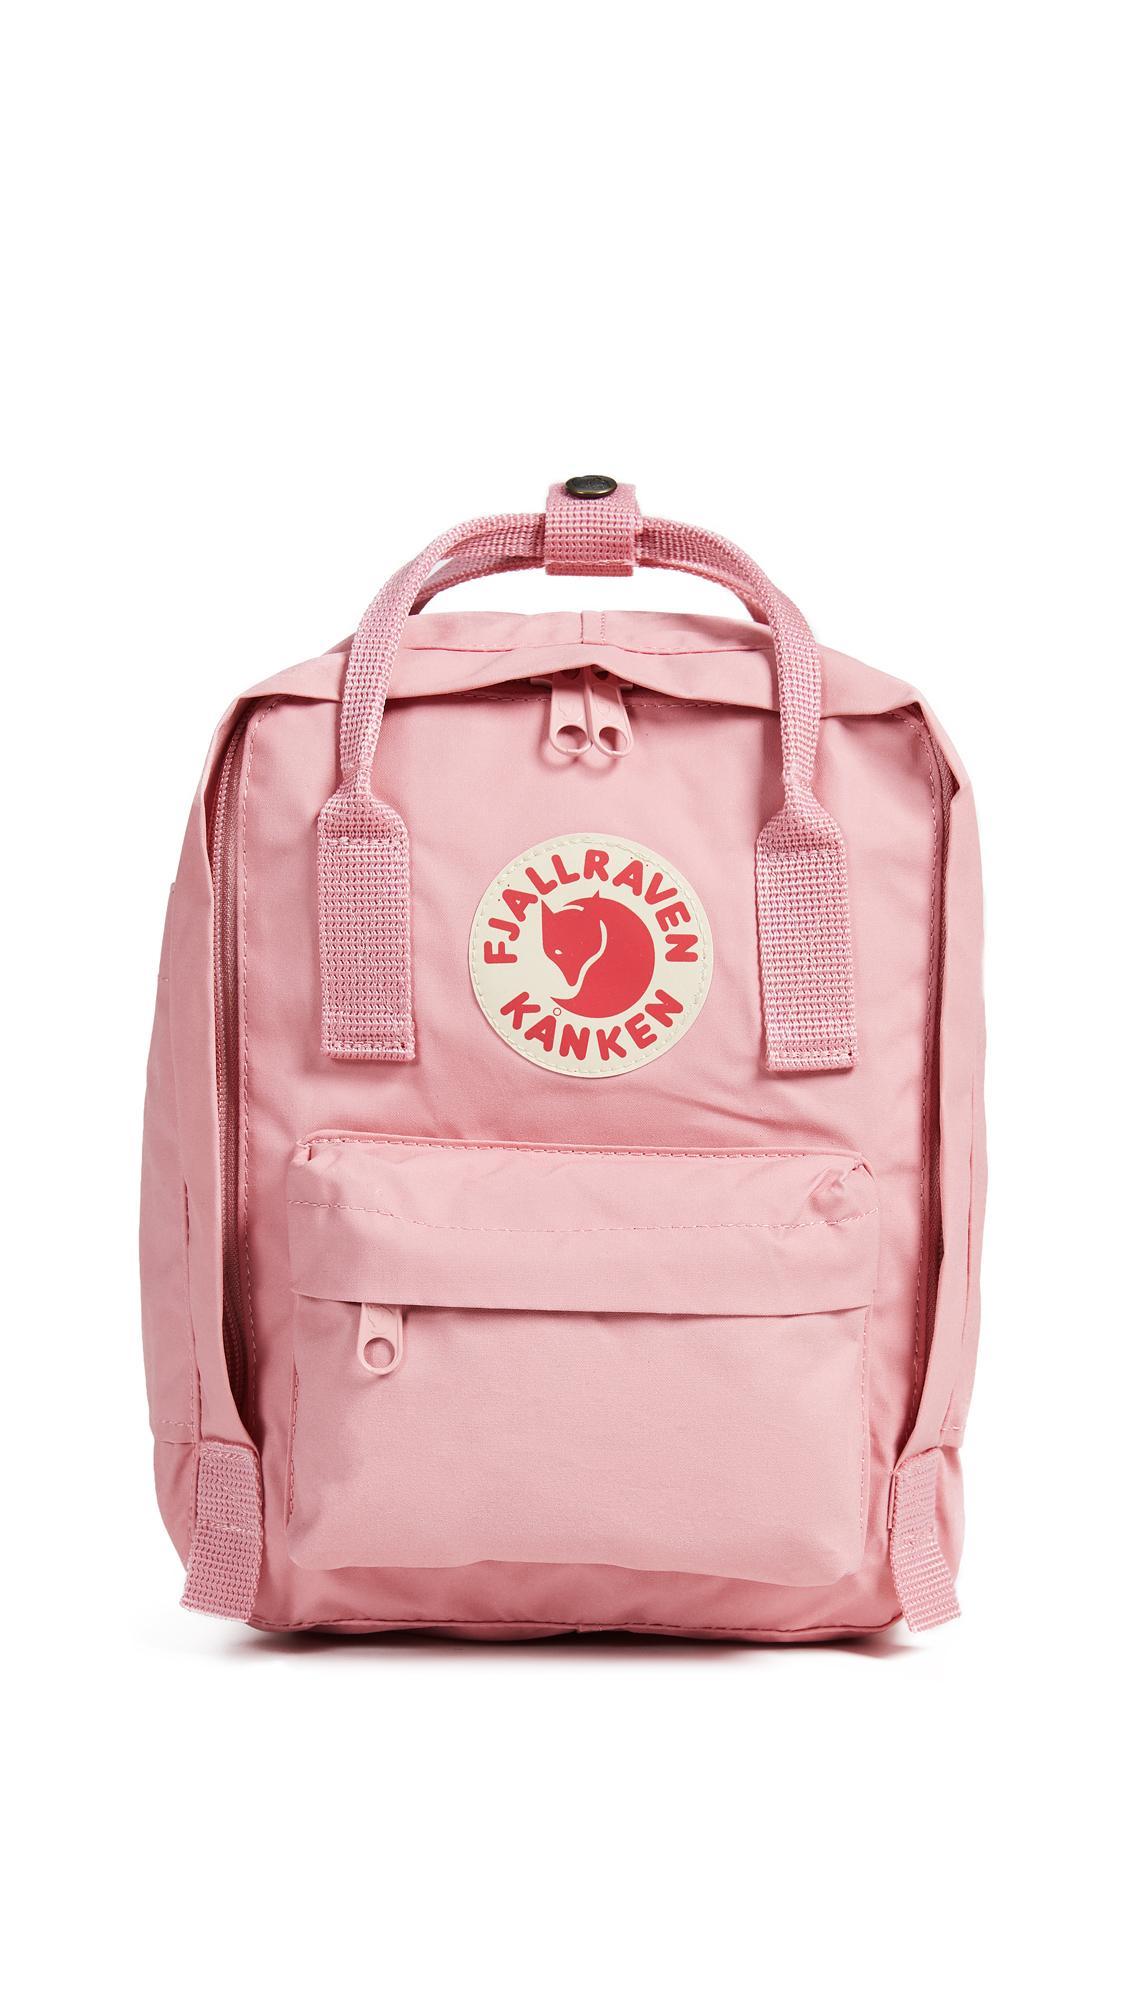 0c9adec1a3b7 Fjall Raven Kanken Mini Backpack In Pink